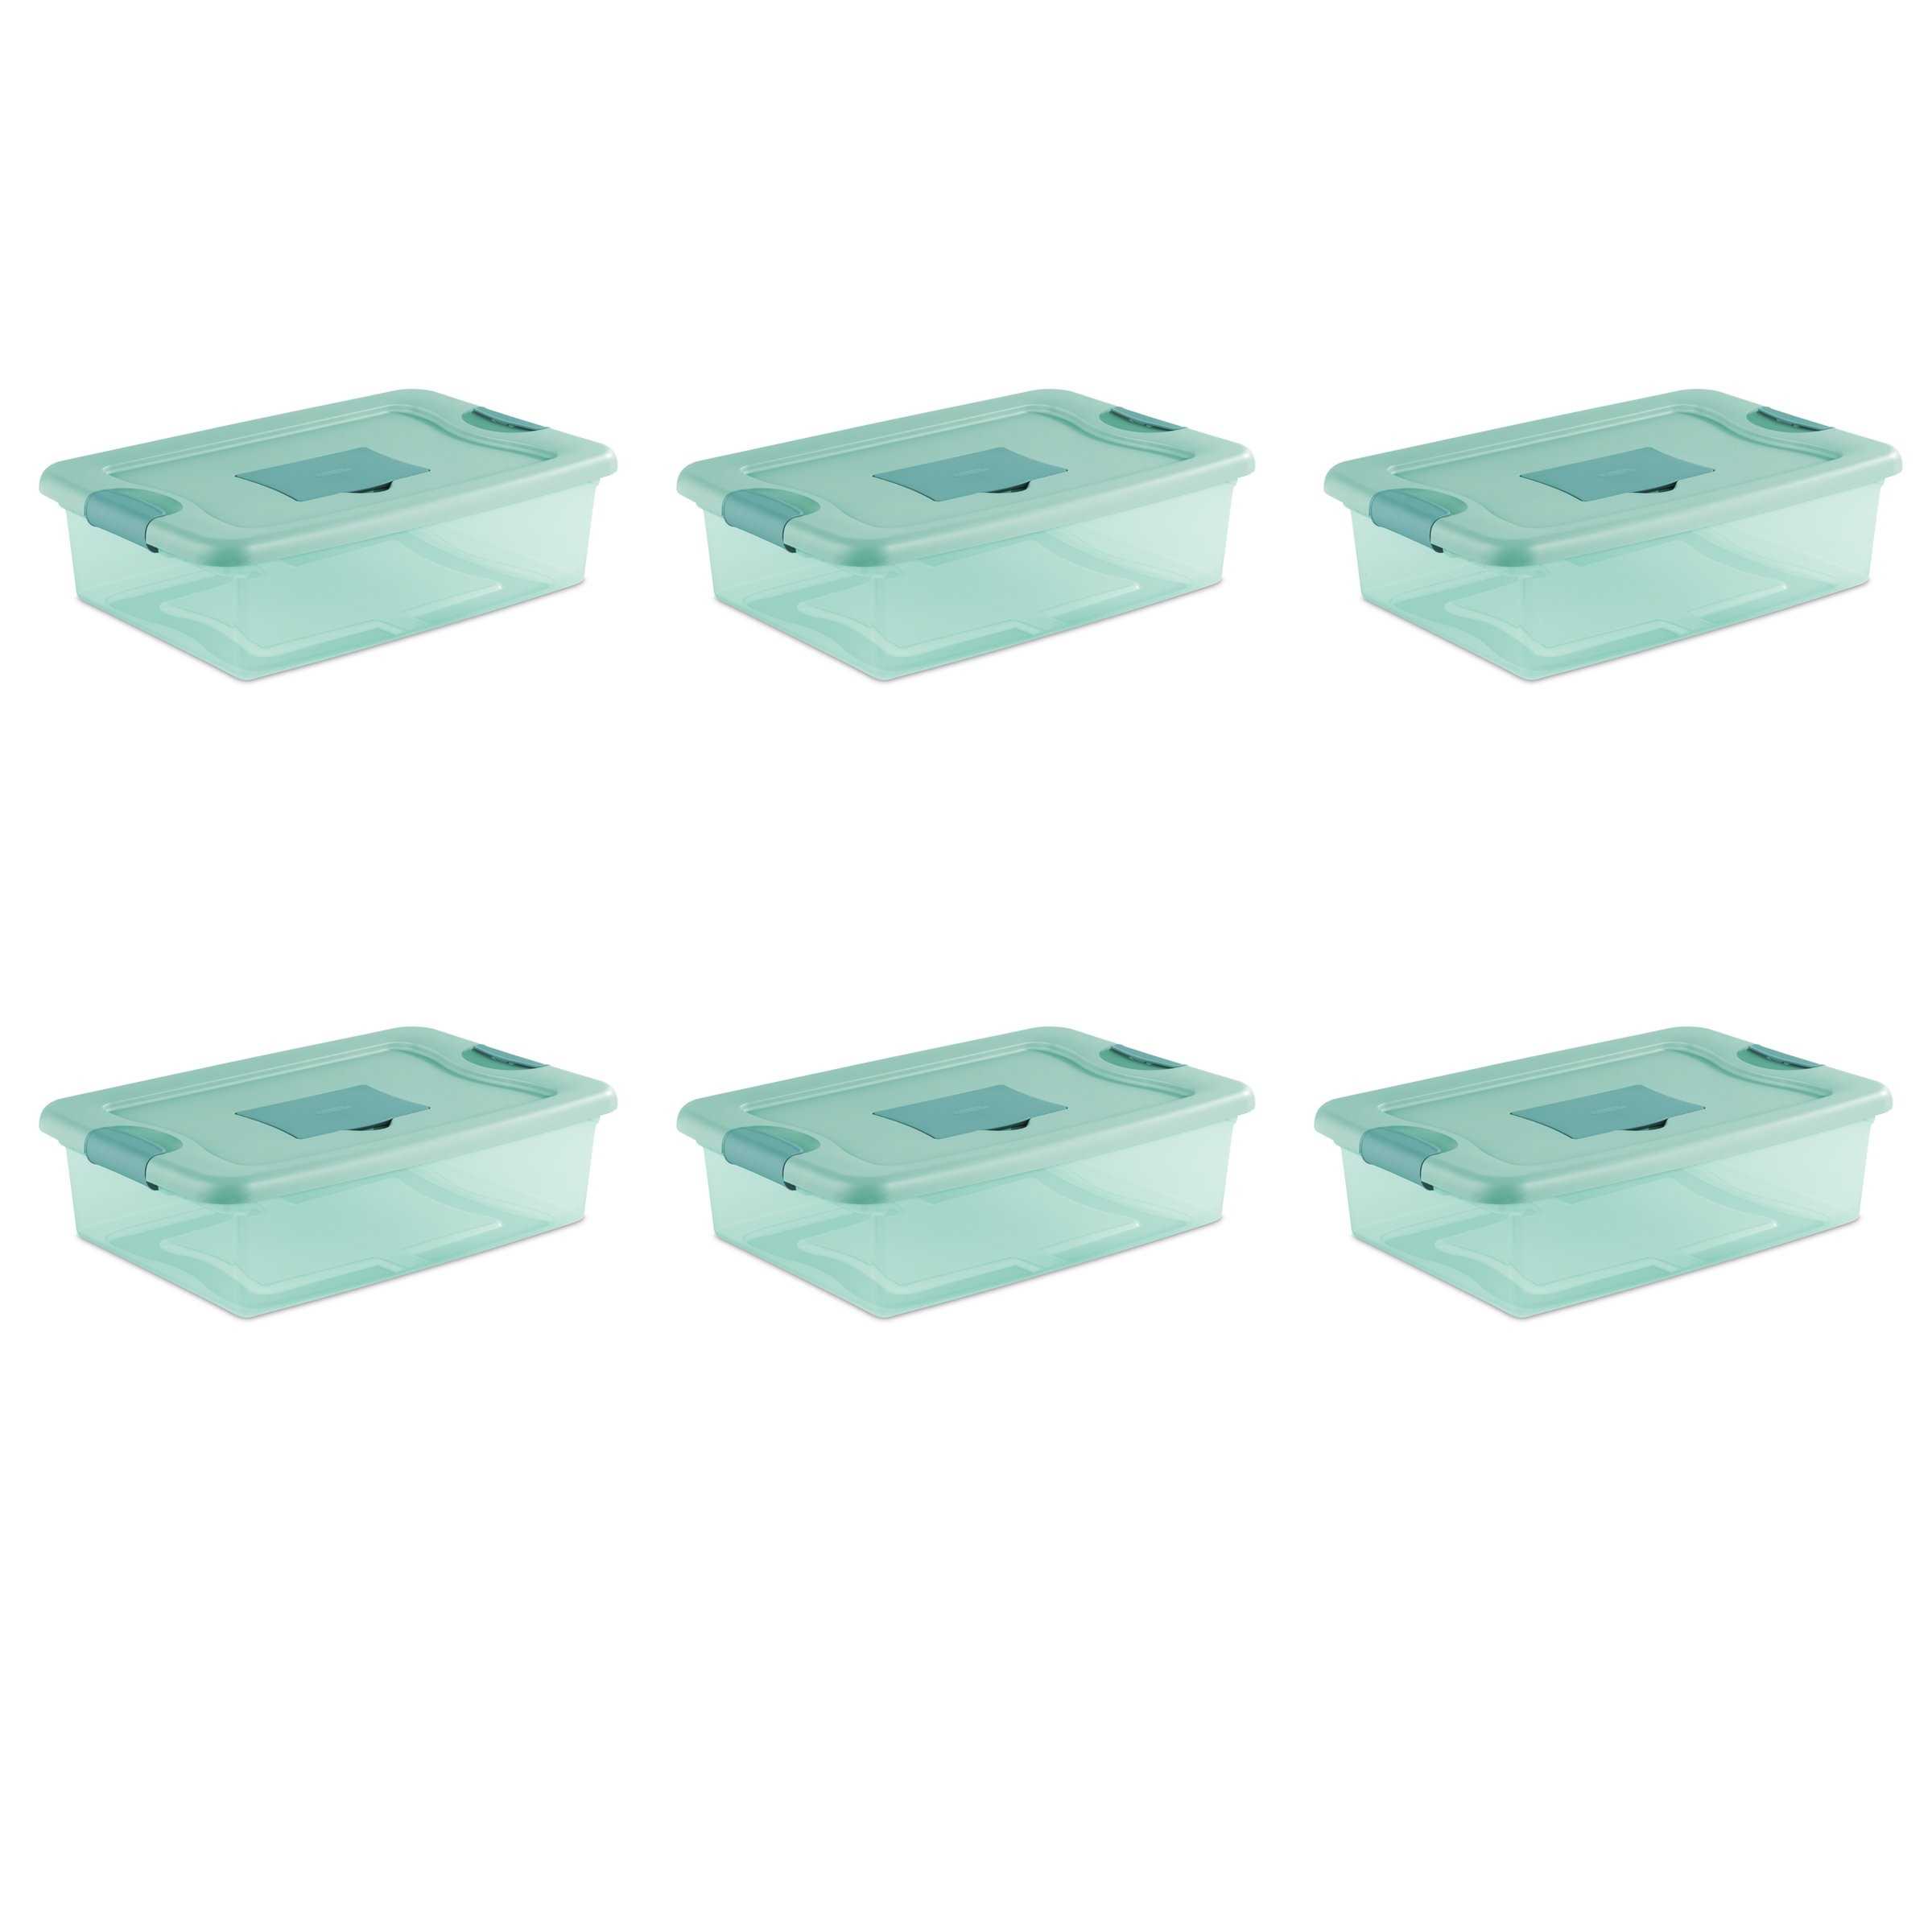 STERILITE 15067Y06 32 Qt, 30L Fresh Scent Box, Aqua Tent Base with Aqua Chrome Lid & Teal Splash Latches, 6-Pack by STERILITE